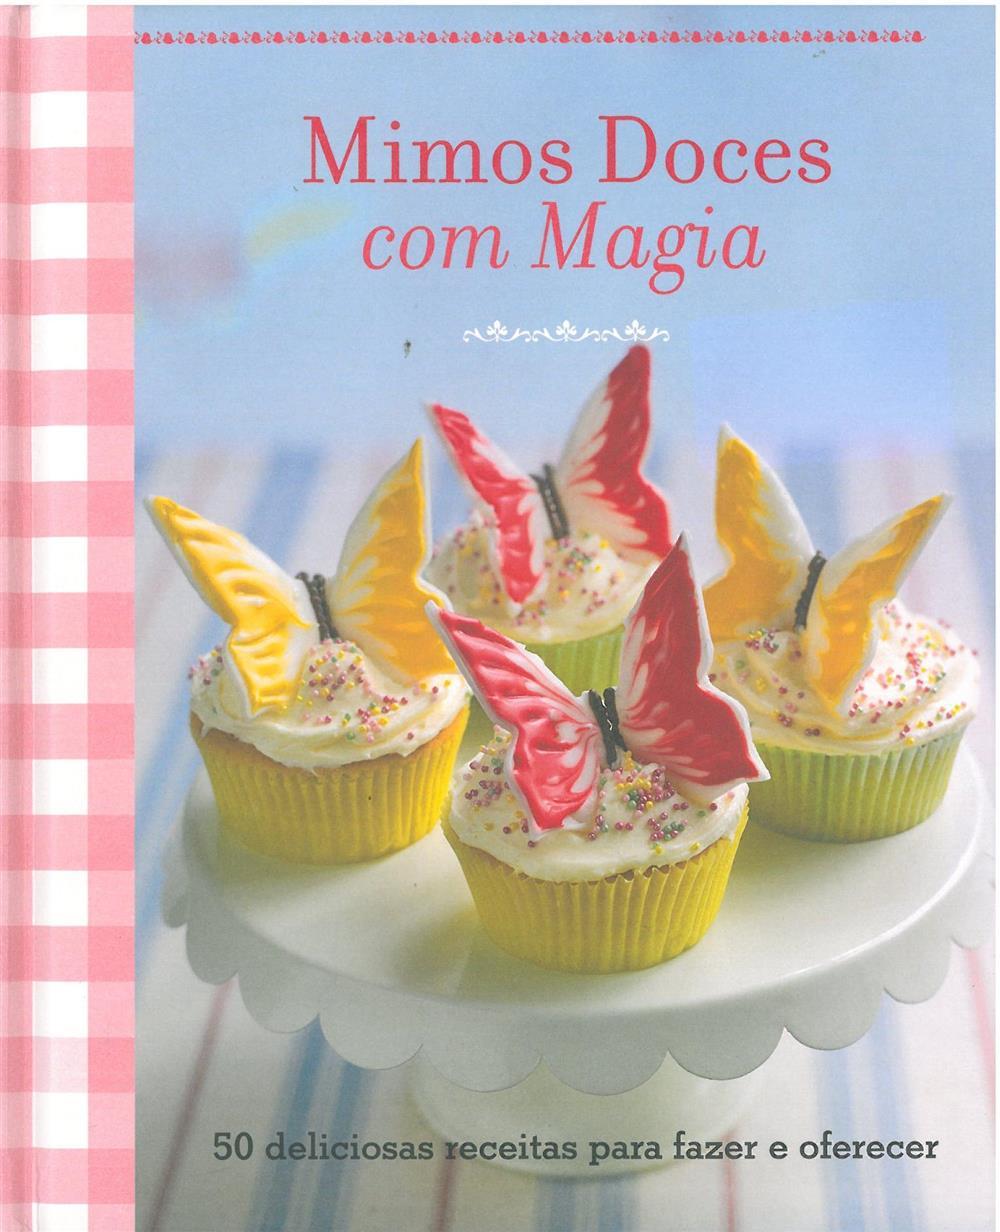 Mimos doces com magia_.jpg